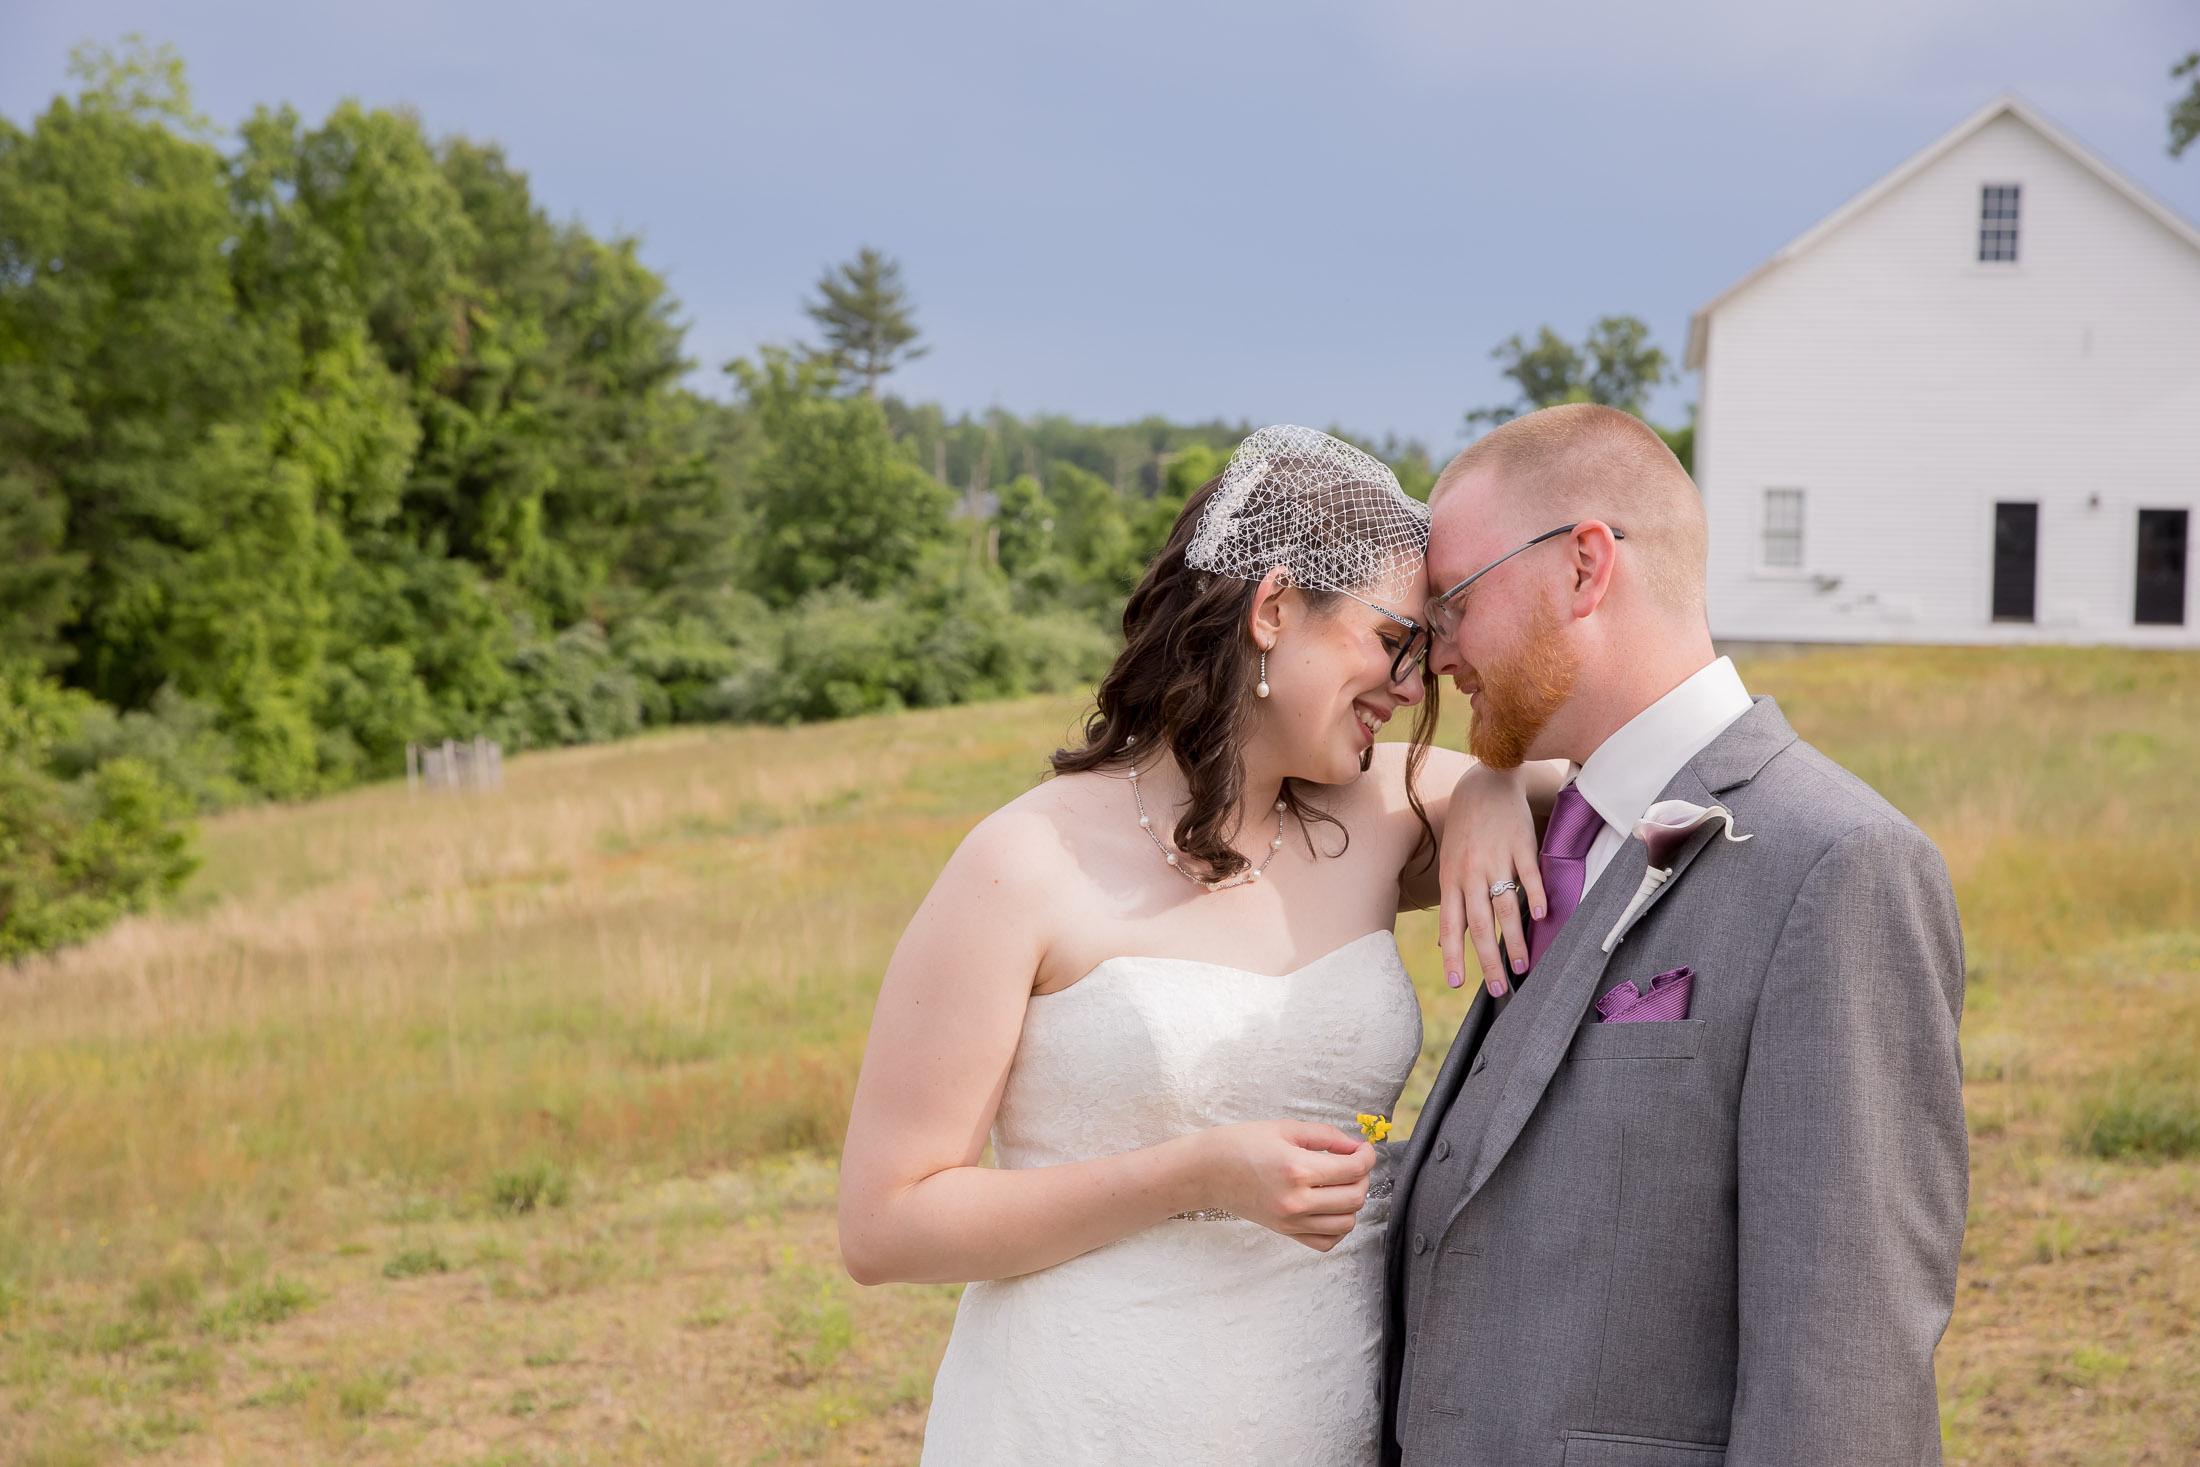 couple photos, romantic, field, wedding, tracy jenkins photography, publick house, Massachusetts, new england,  photography